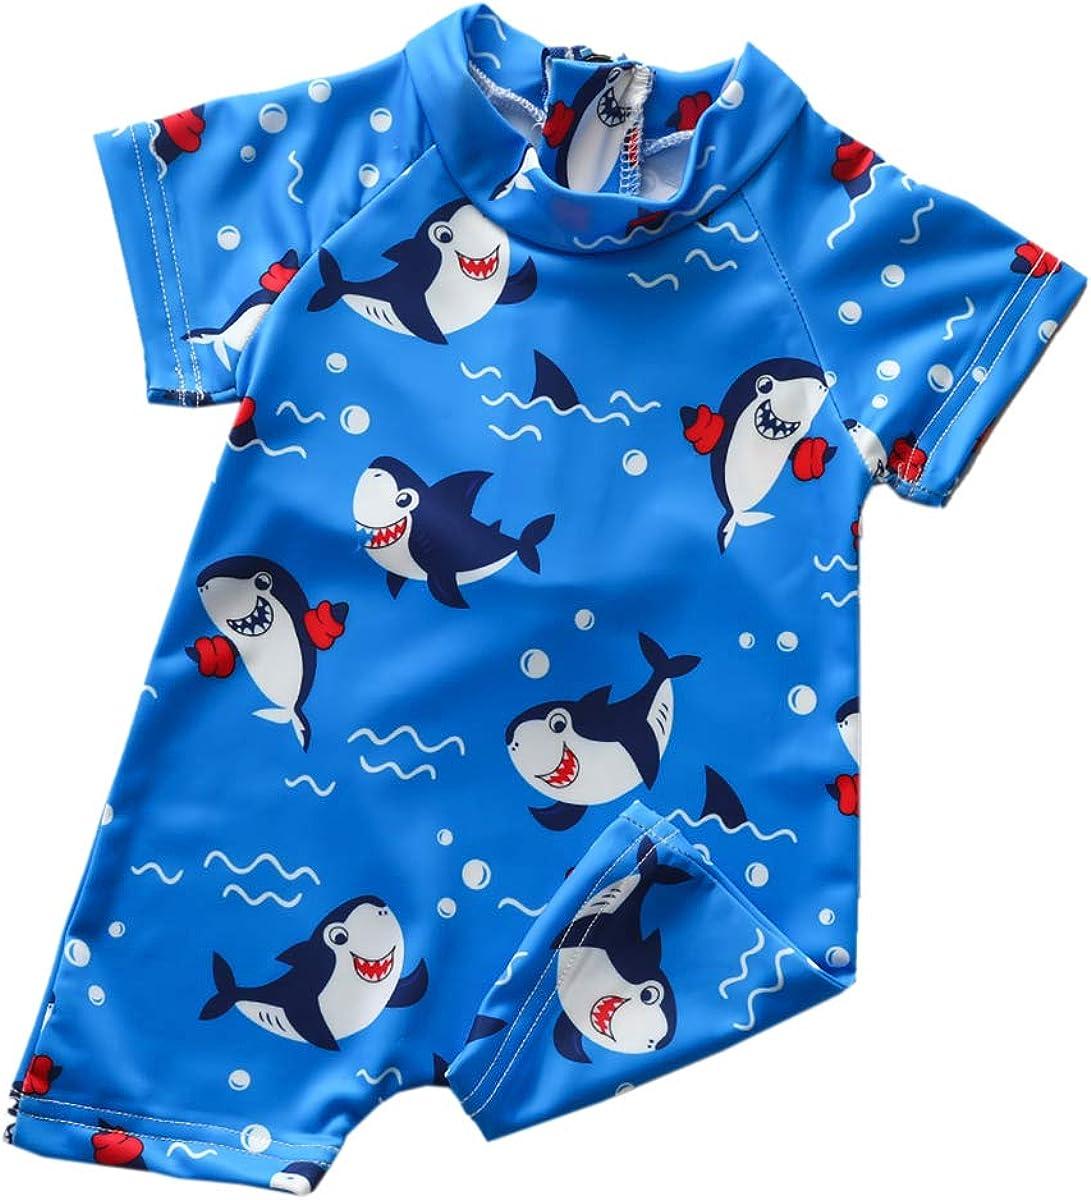 Toddler Infant Ranking TOP1 Baby Boy Ranking TOP7 Rash Bathing Suit Sharks Swimwear Guard